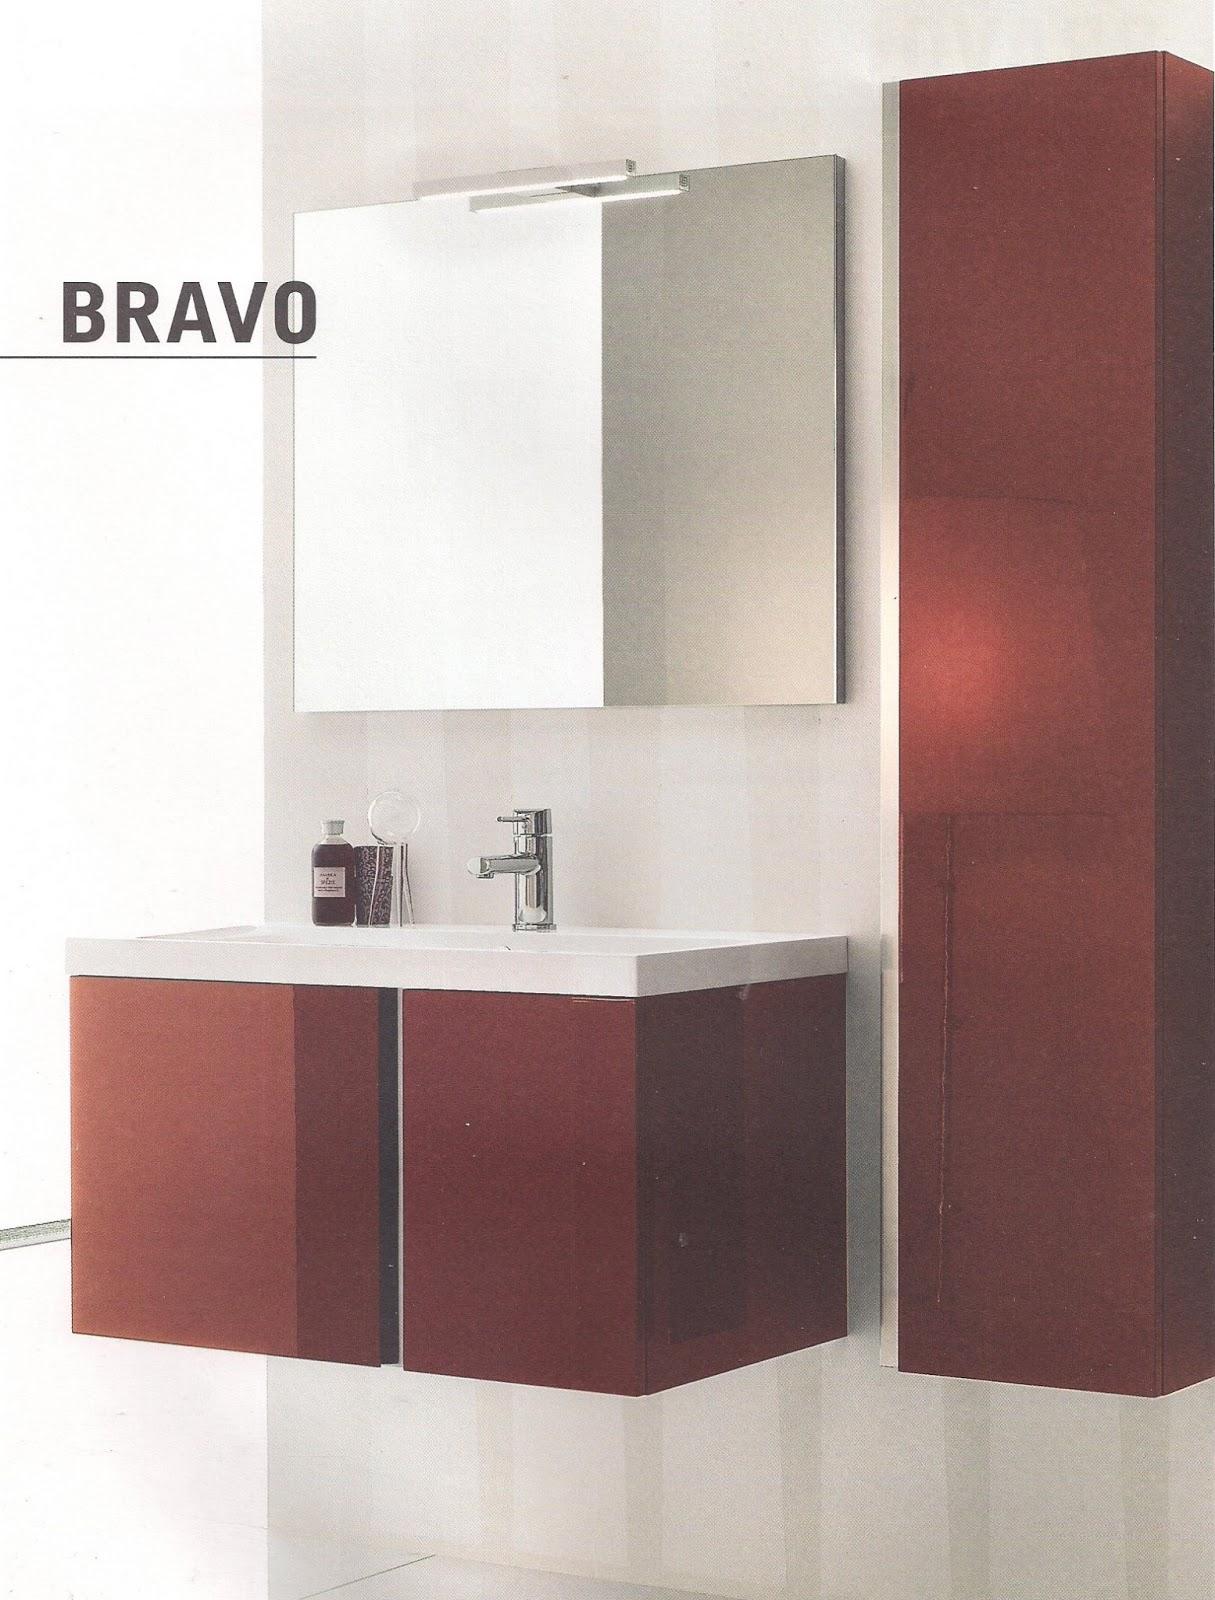 Aqualys burdin bossert prolians besancon collection - Budget salle de bain ...